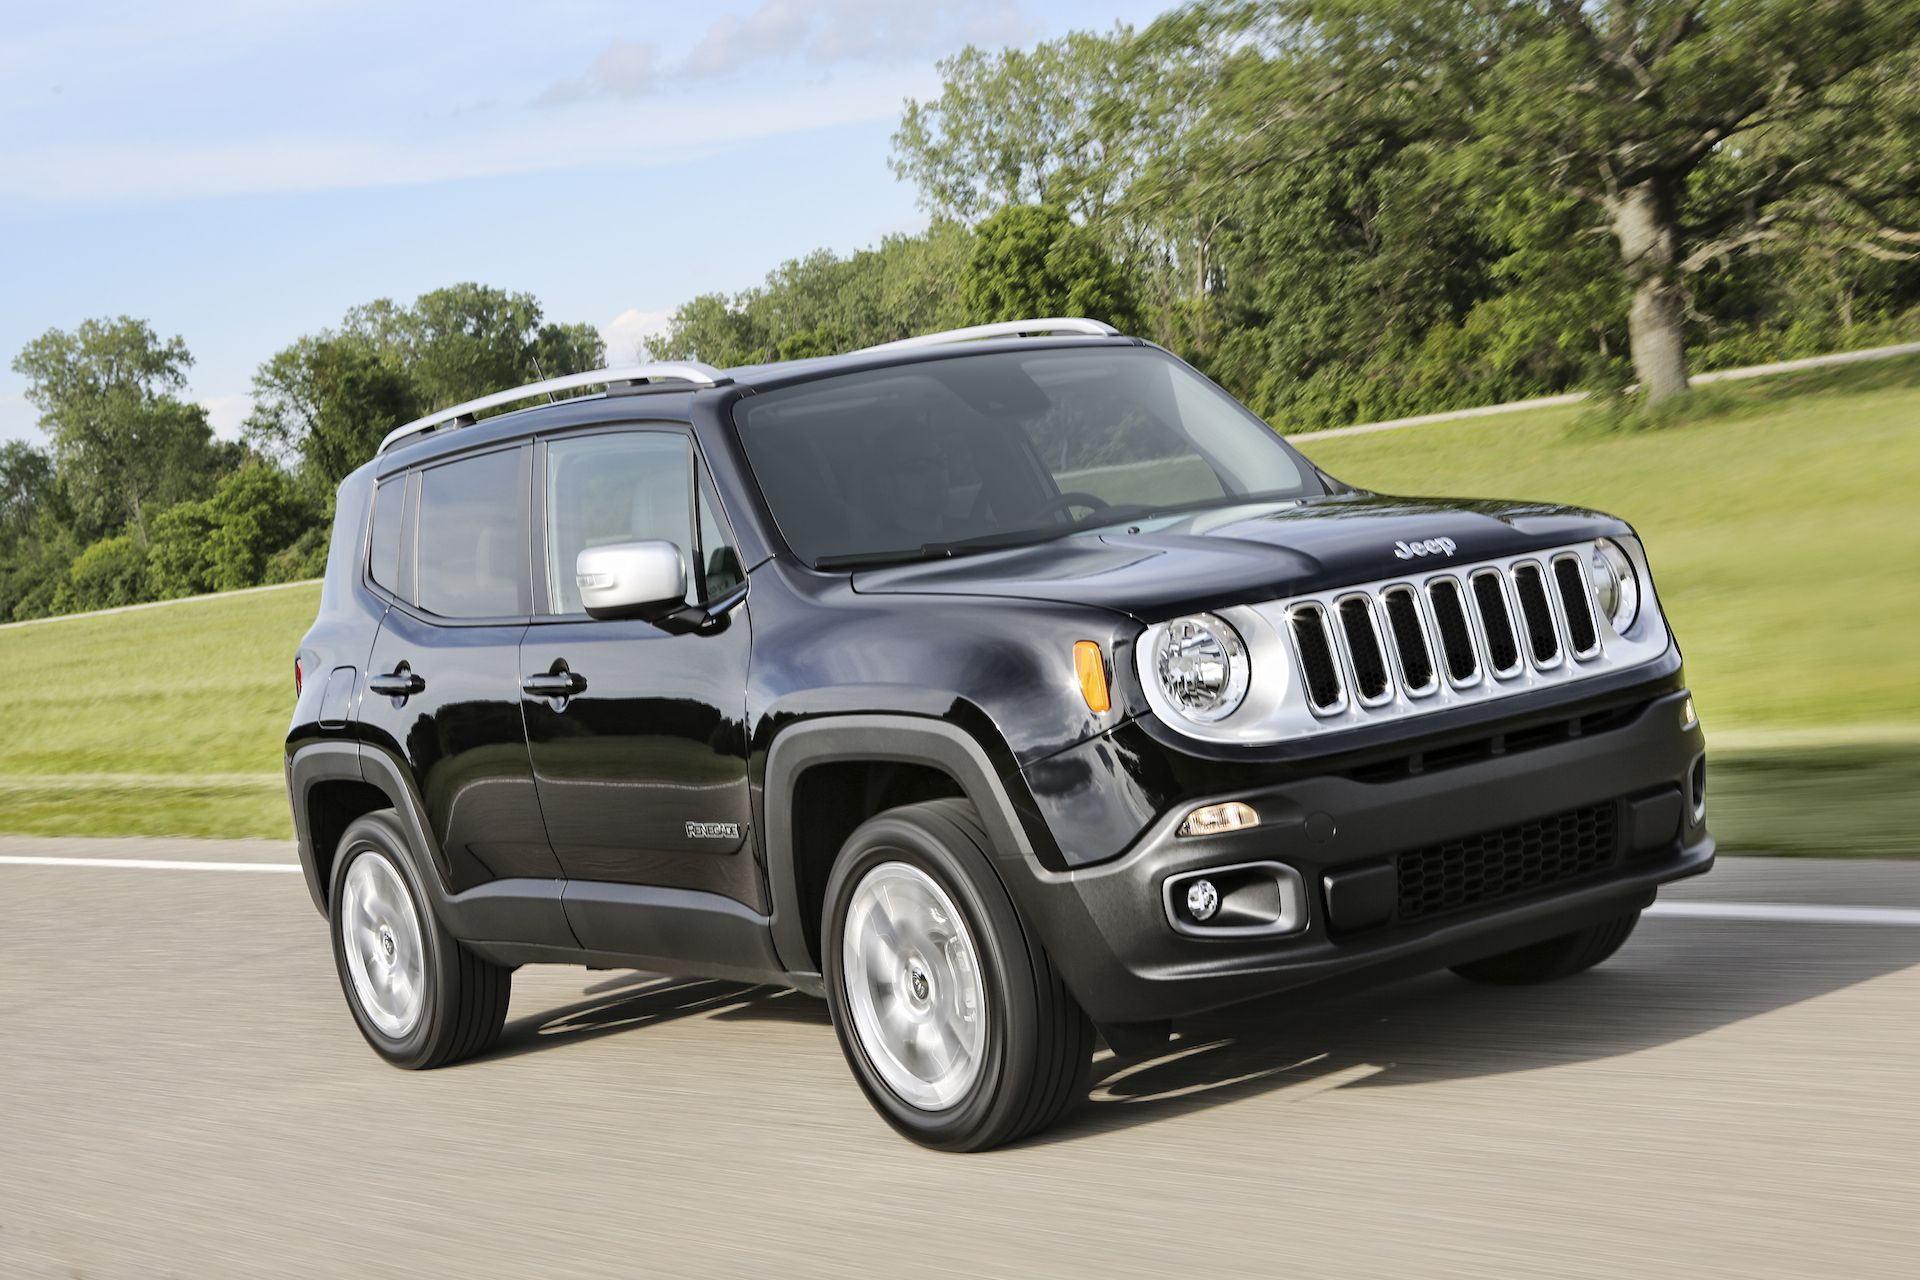 Nissan Juke Vs Jeep Renegade Compare Cars Jeep Renegade Jeep